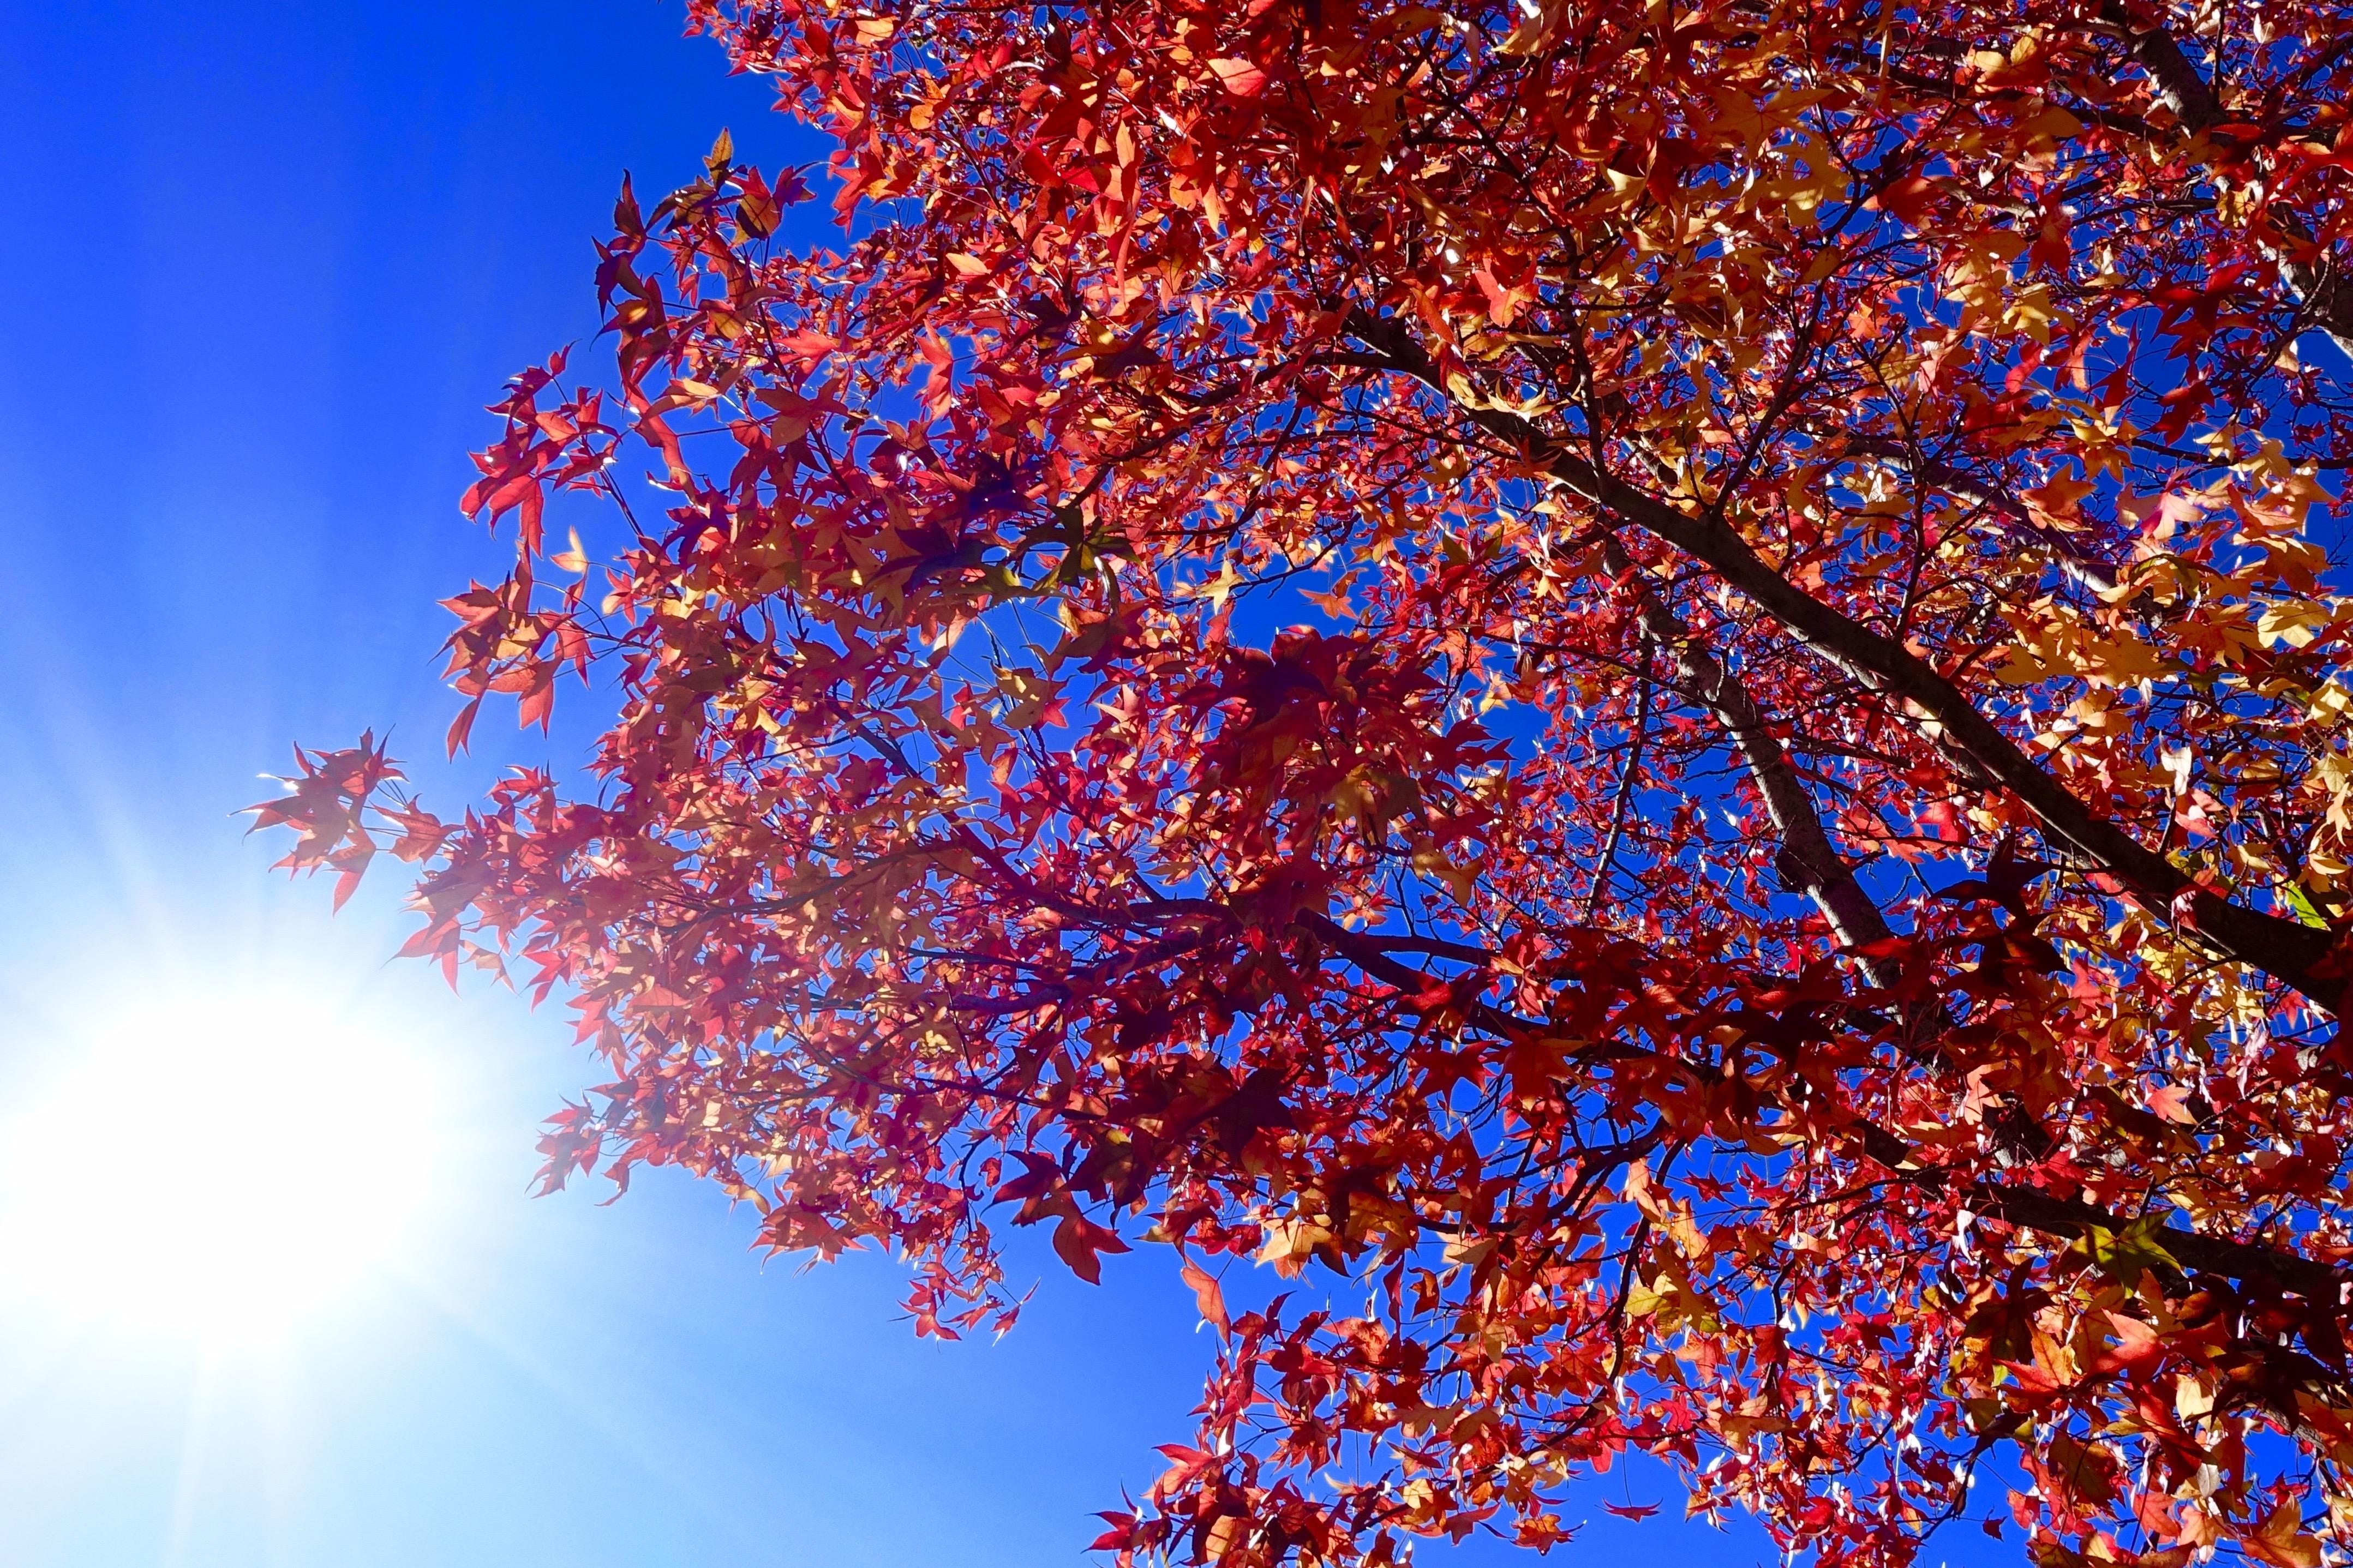 Autumn Leaves in Sun